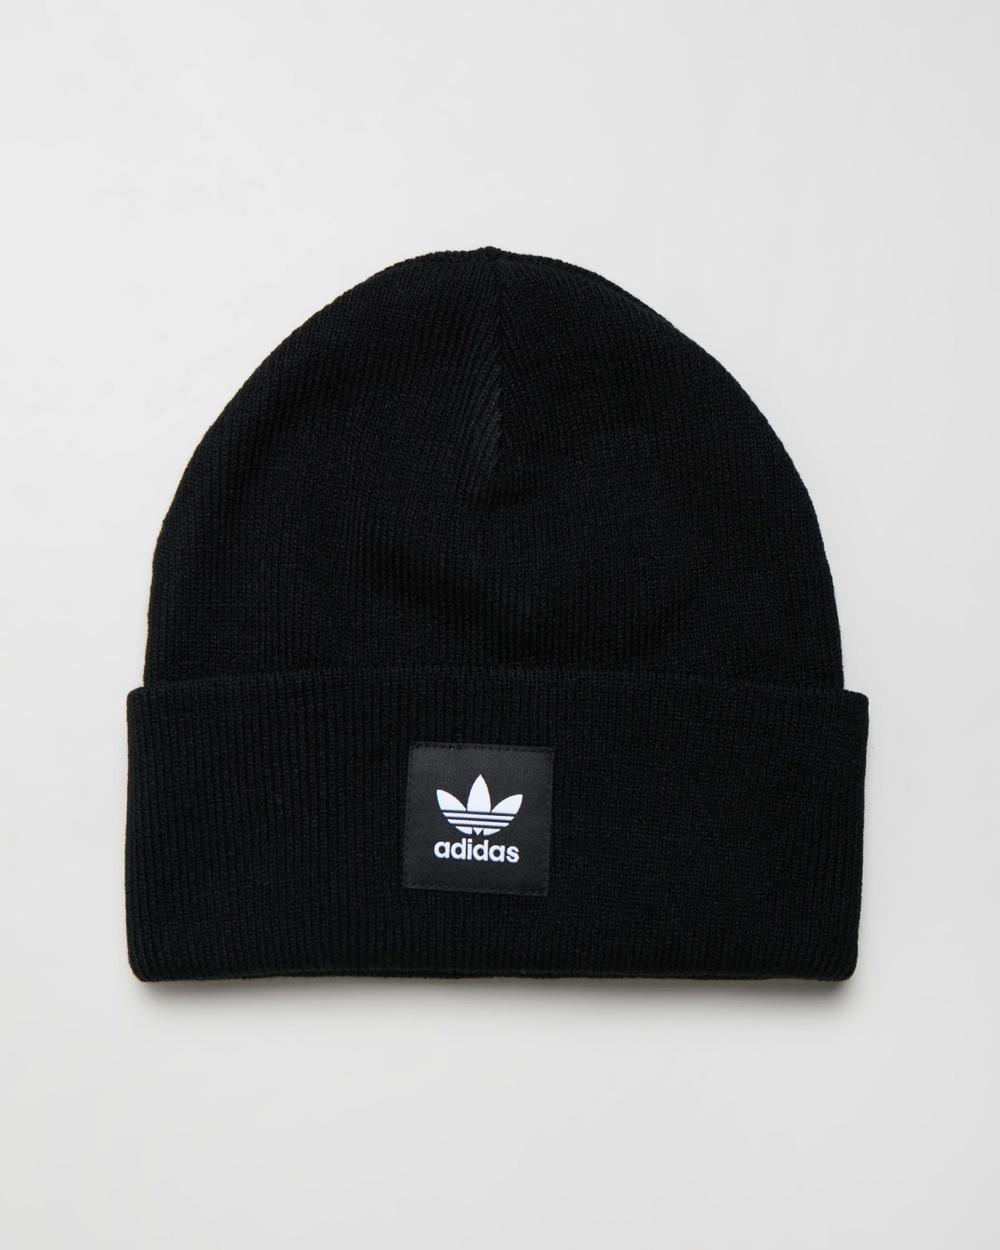 adidas Originals Adicolour Cuff Knit Beanie Headwear Black